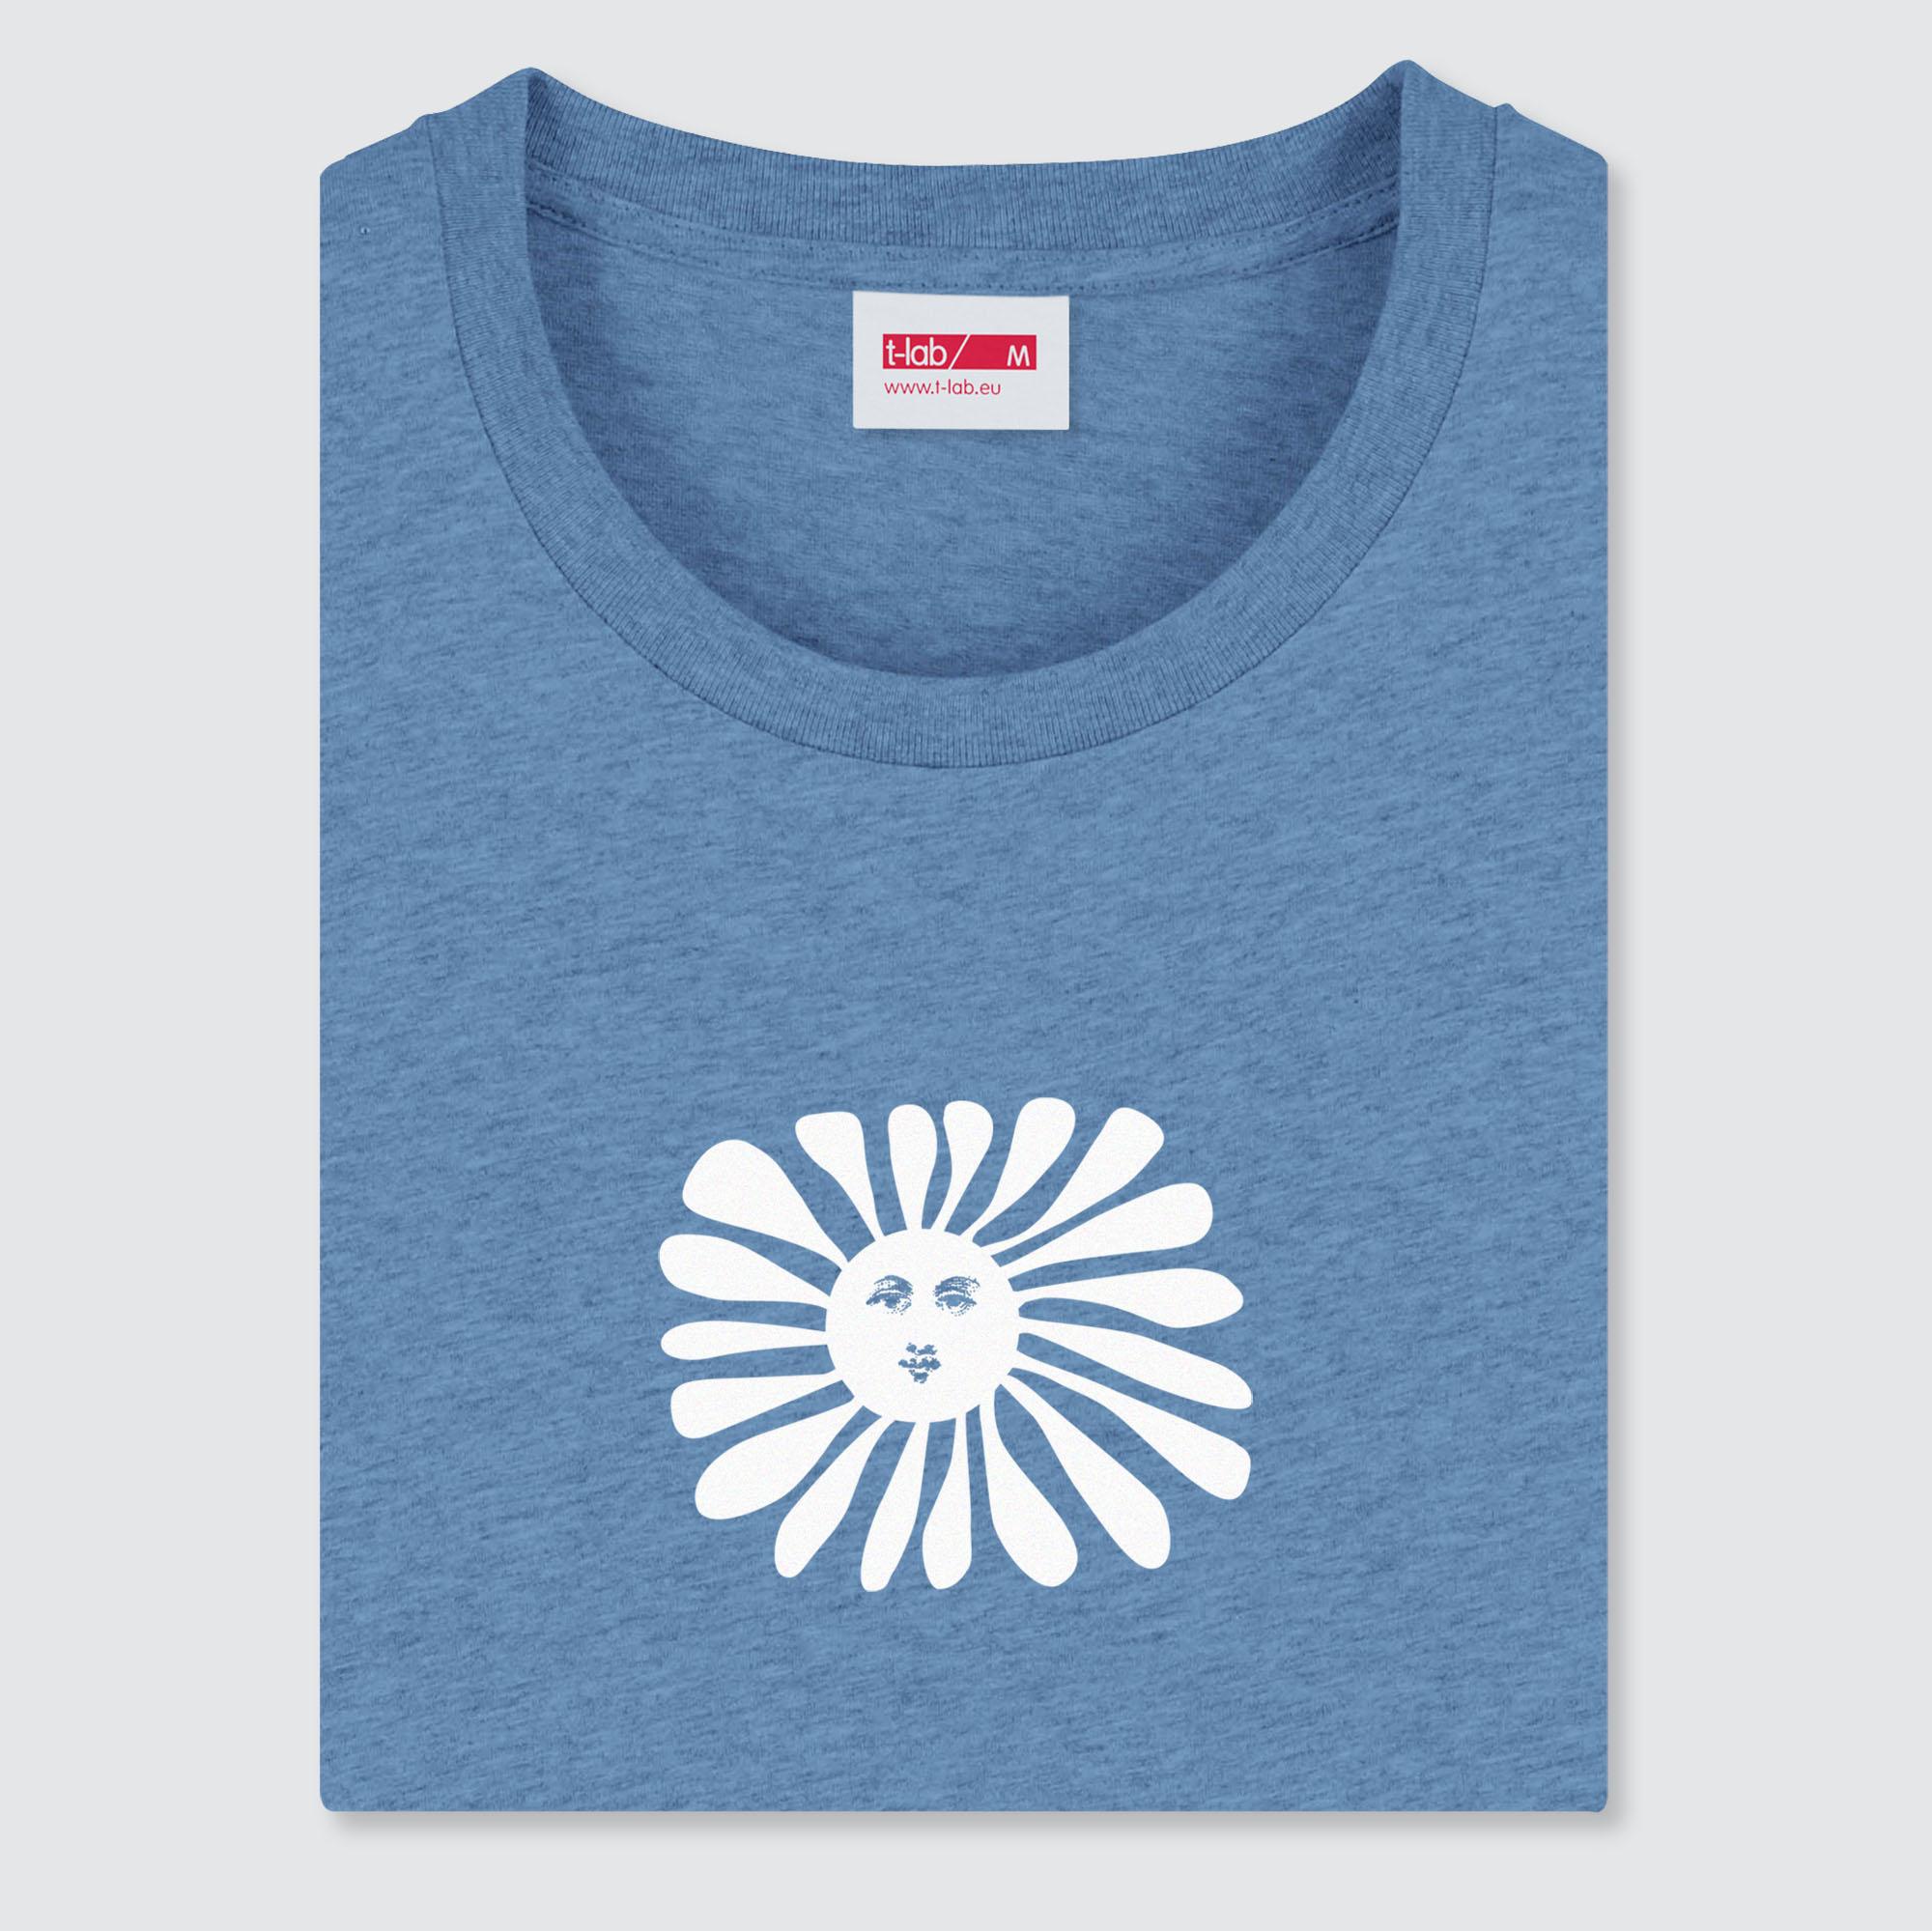 T-lab-Sol-mens-t-shirt-blue